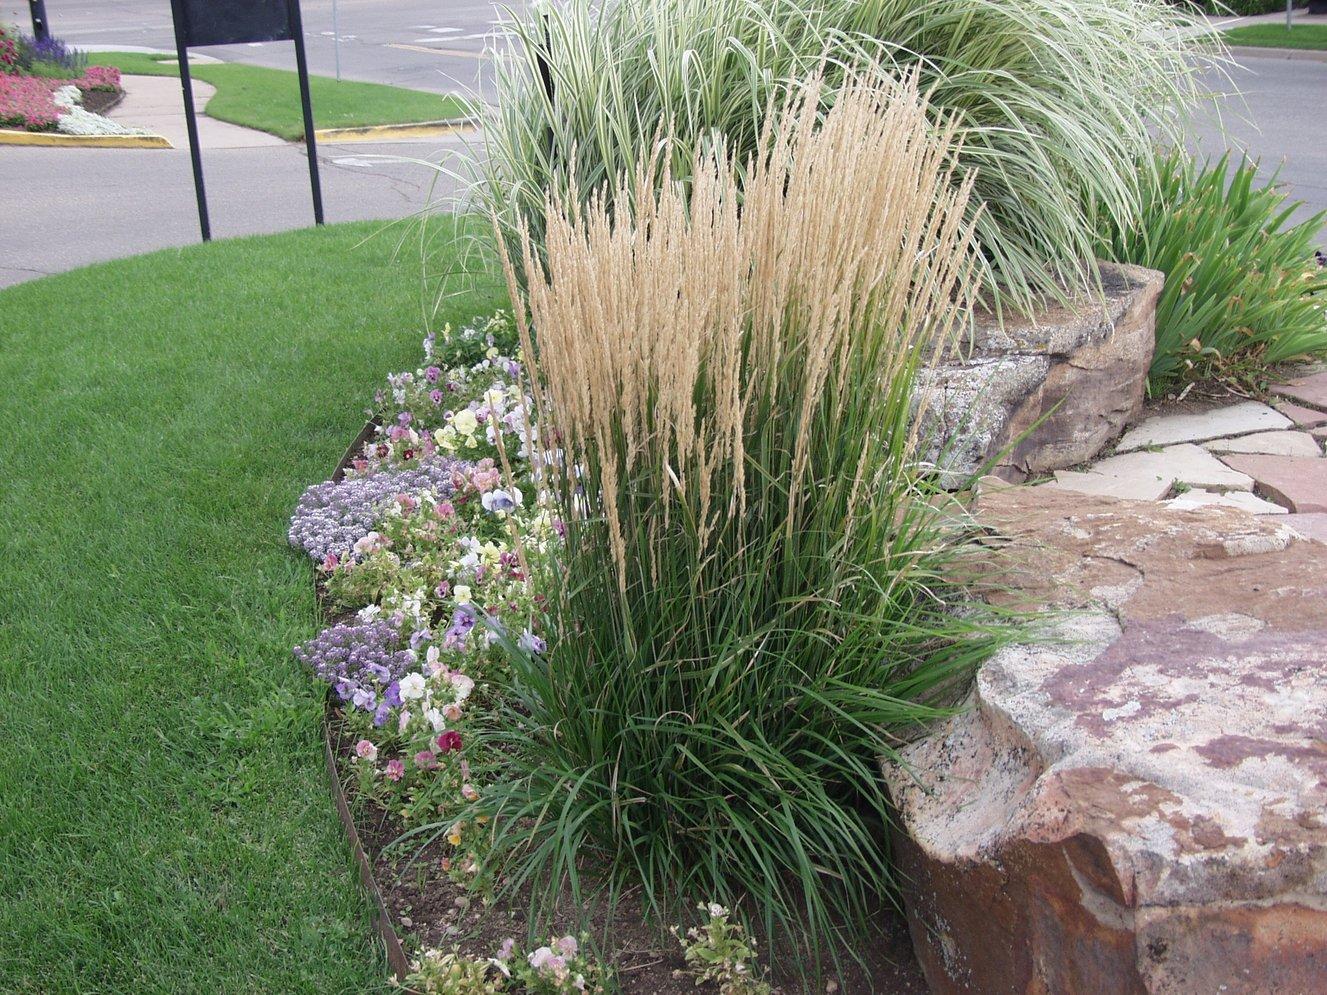 karl_foerster_grass_in_Tulsa_Landscape.jpg